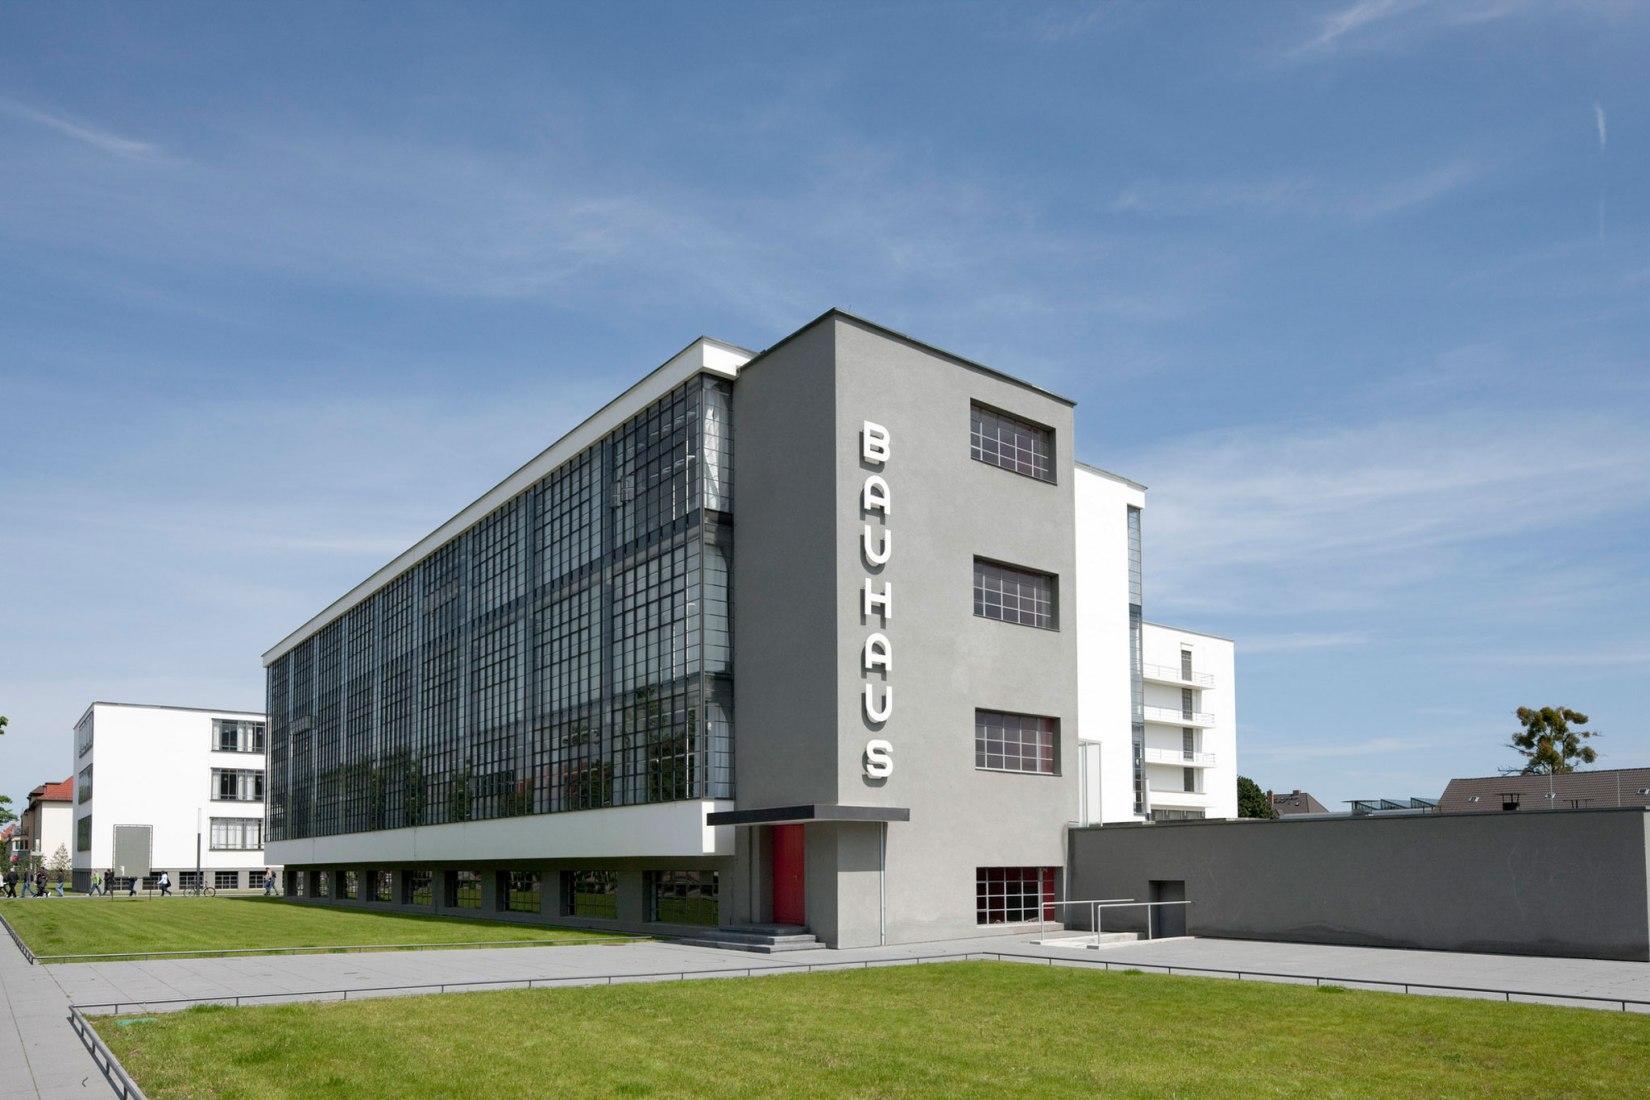 Walter Gropius, Bauhaus, Dessau, 1925–1926. Photograph by Tadashi Okochi. 2010, Stiftung Bauhaus Dessau